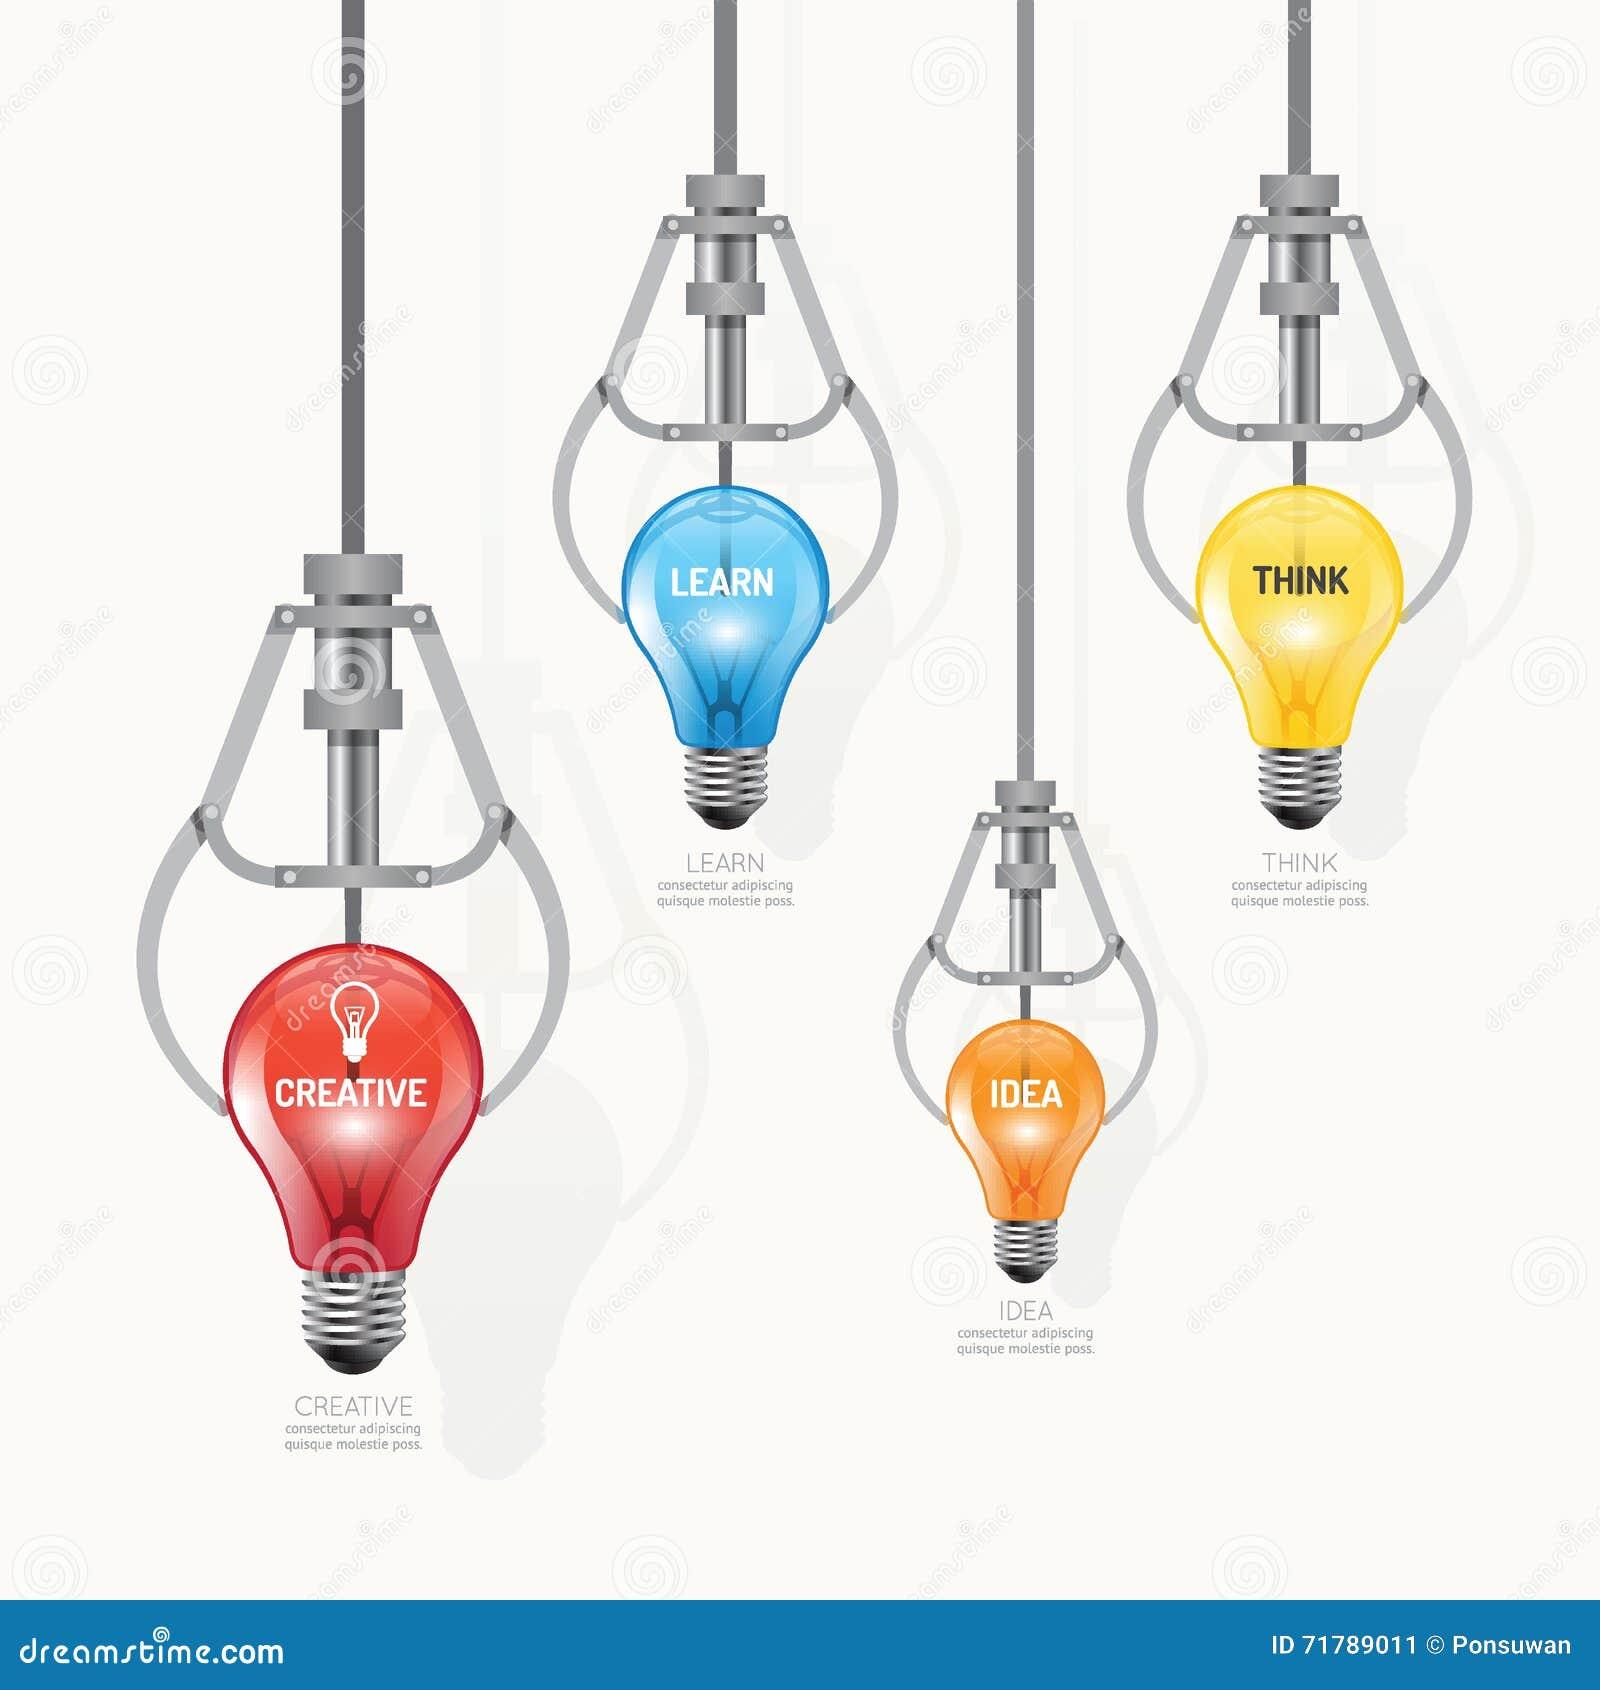 Infographic Education Claw Game With Lightbulb Template Design Vector Idea Light Bulb For Creative Diagram Cartoon 71789011